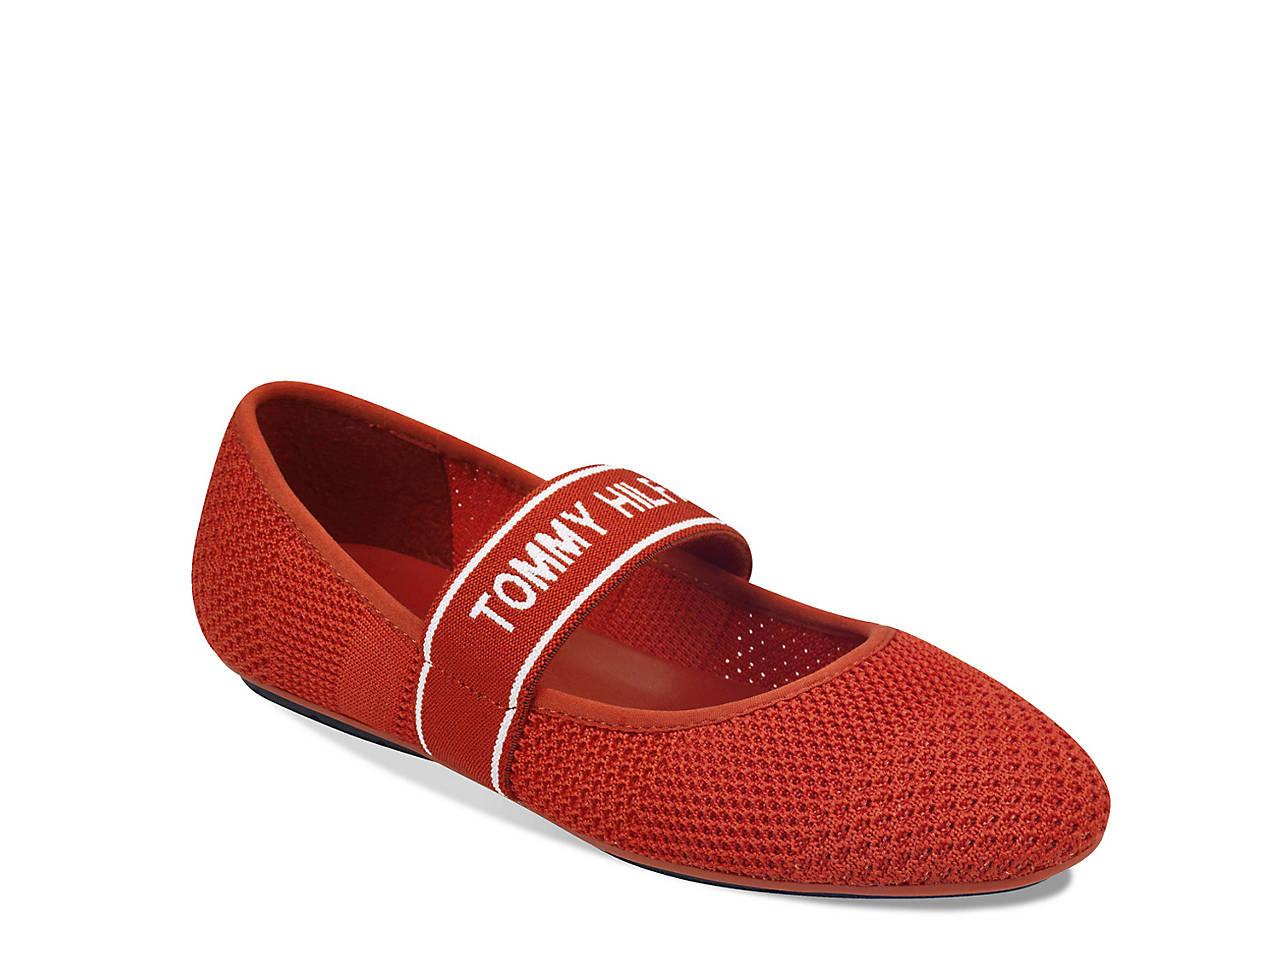 5672aaac7d2a Tommy Hilfiger Riwan Flat Women s Shoes